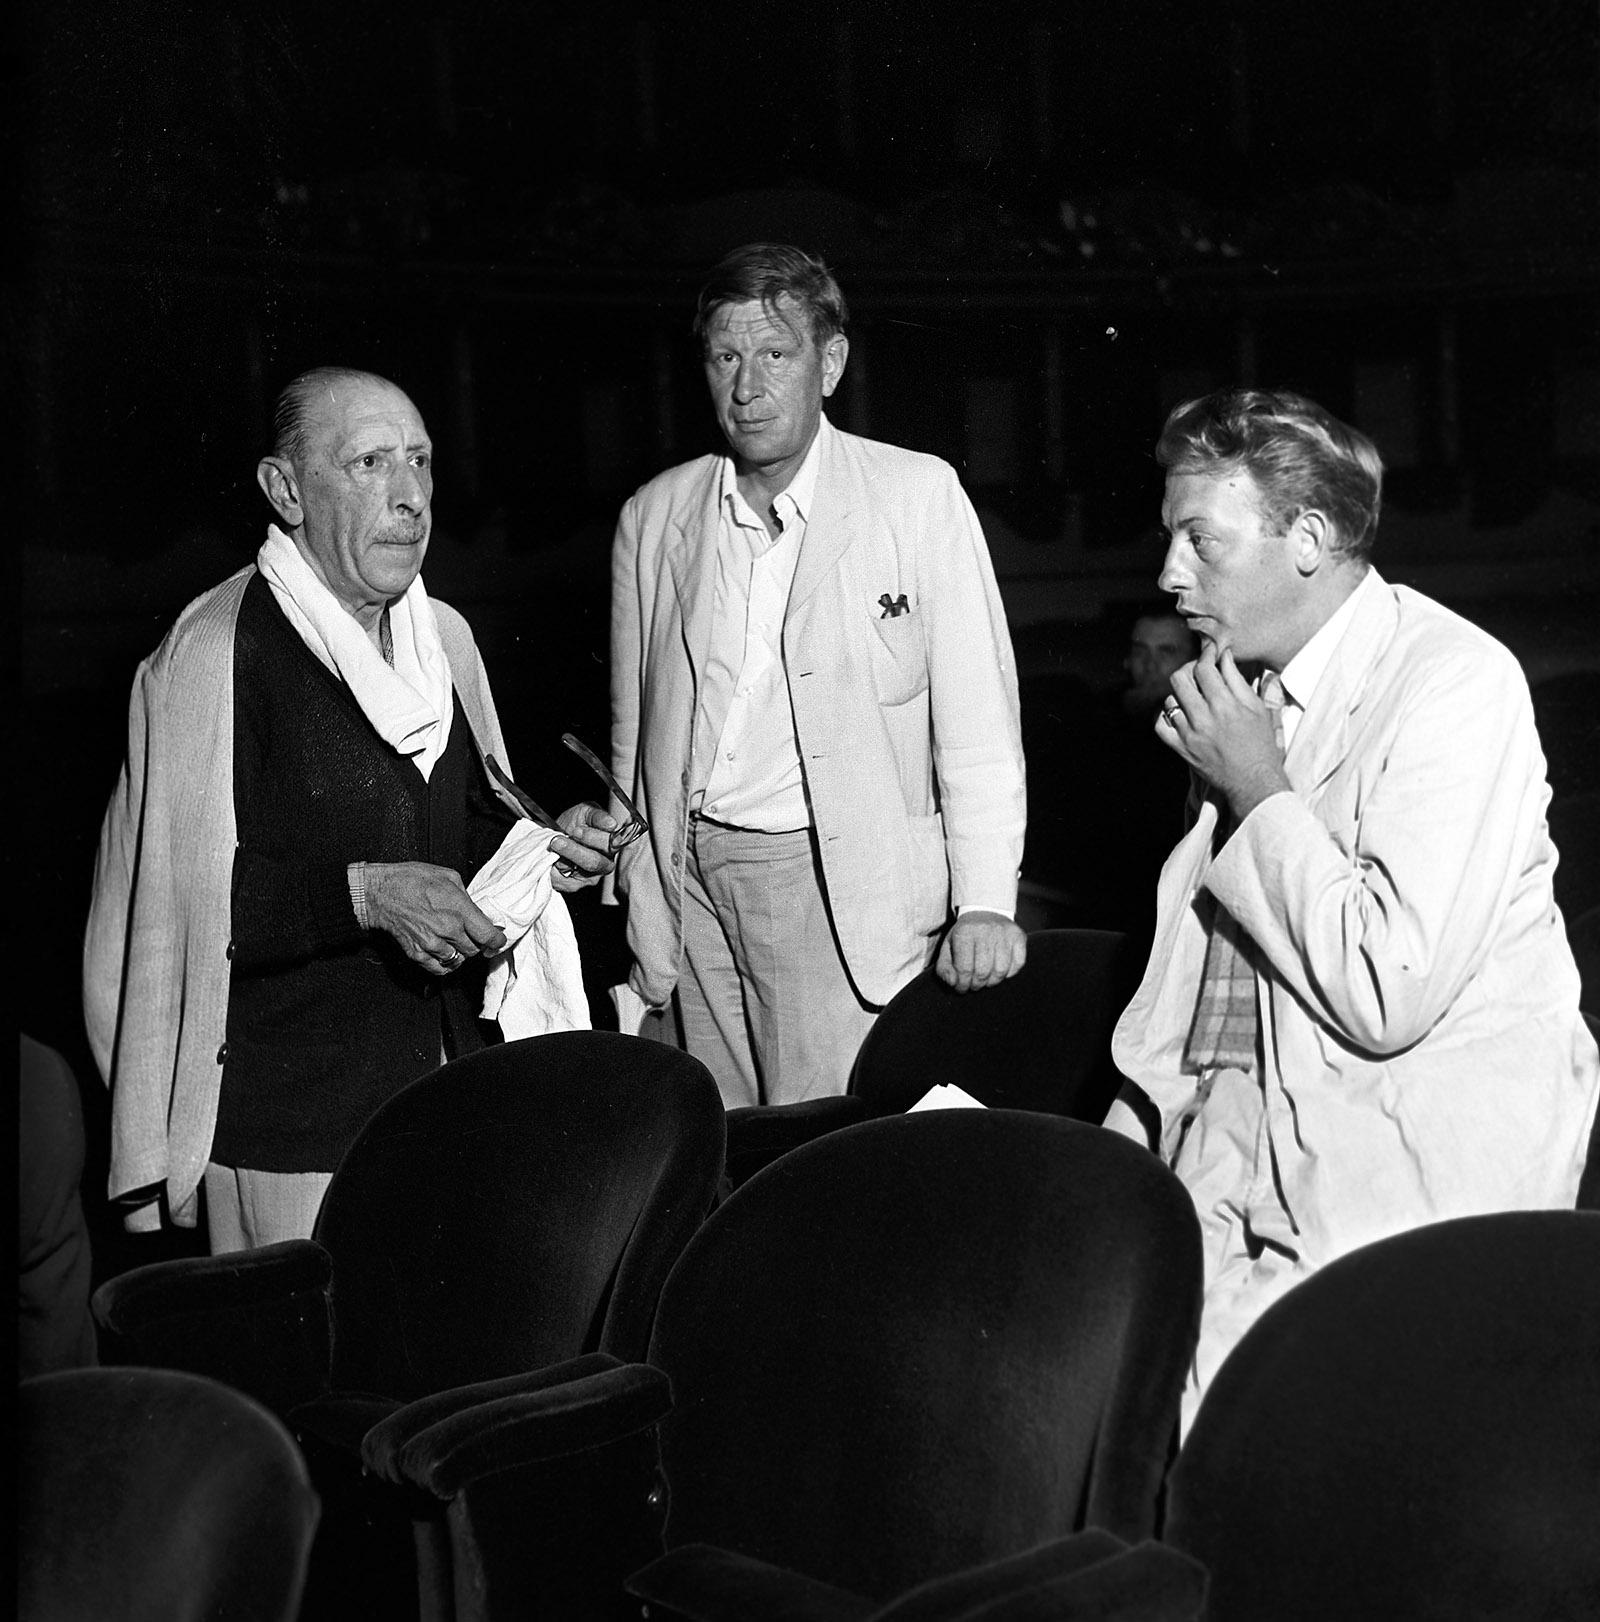 Igor Stravinsky, W.H. Auden, and Chester Kallman at a rehearsal of The Rake's Progress, Milan, August 1951